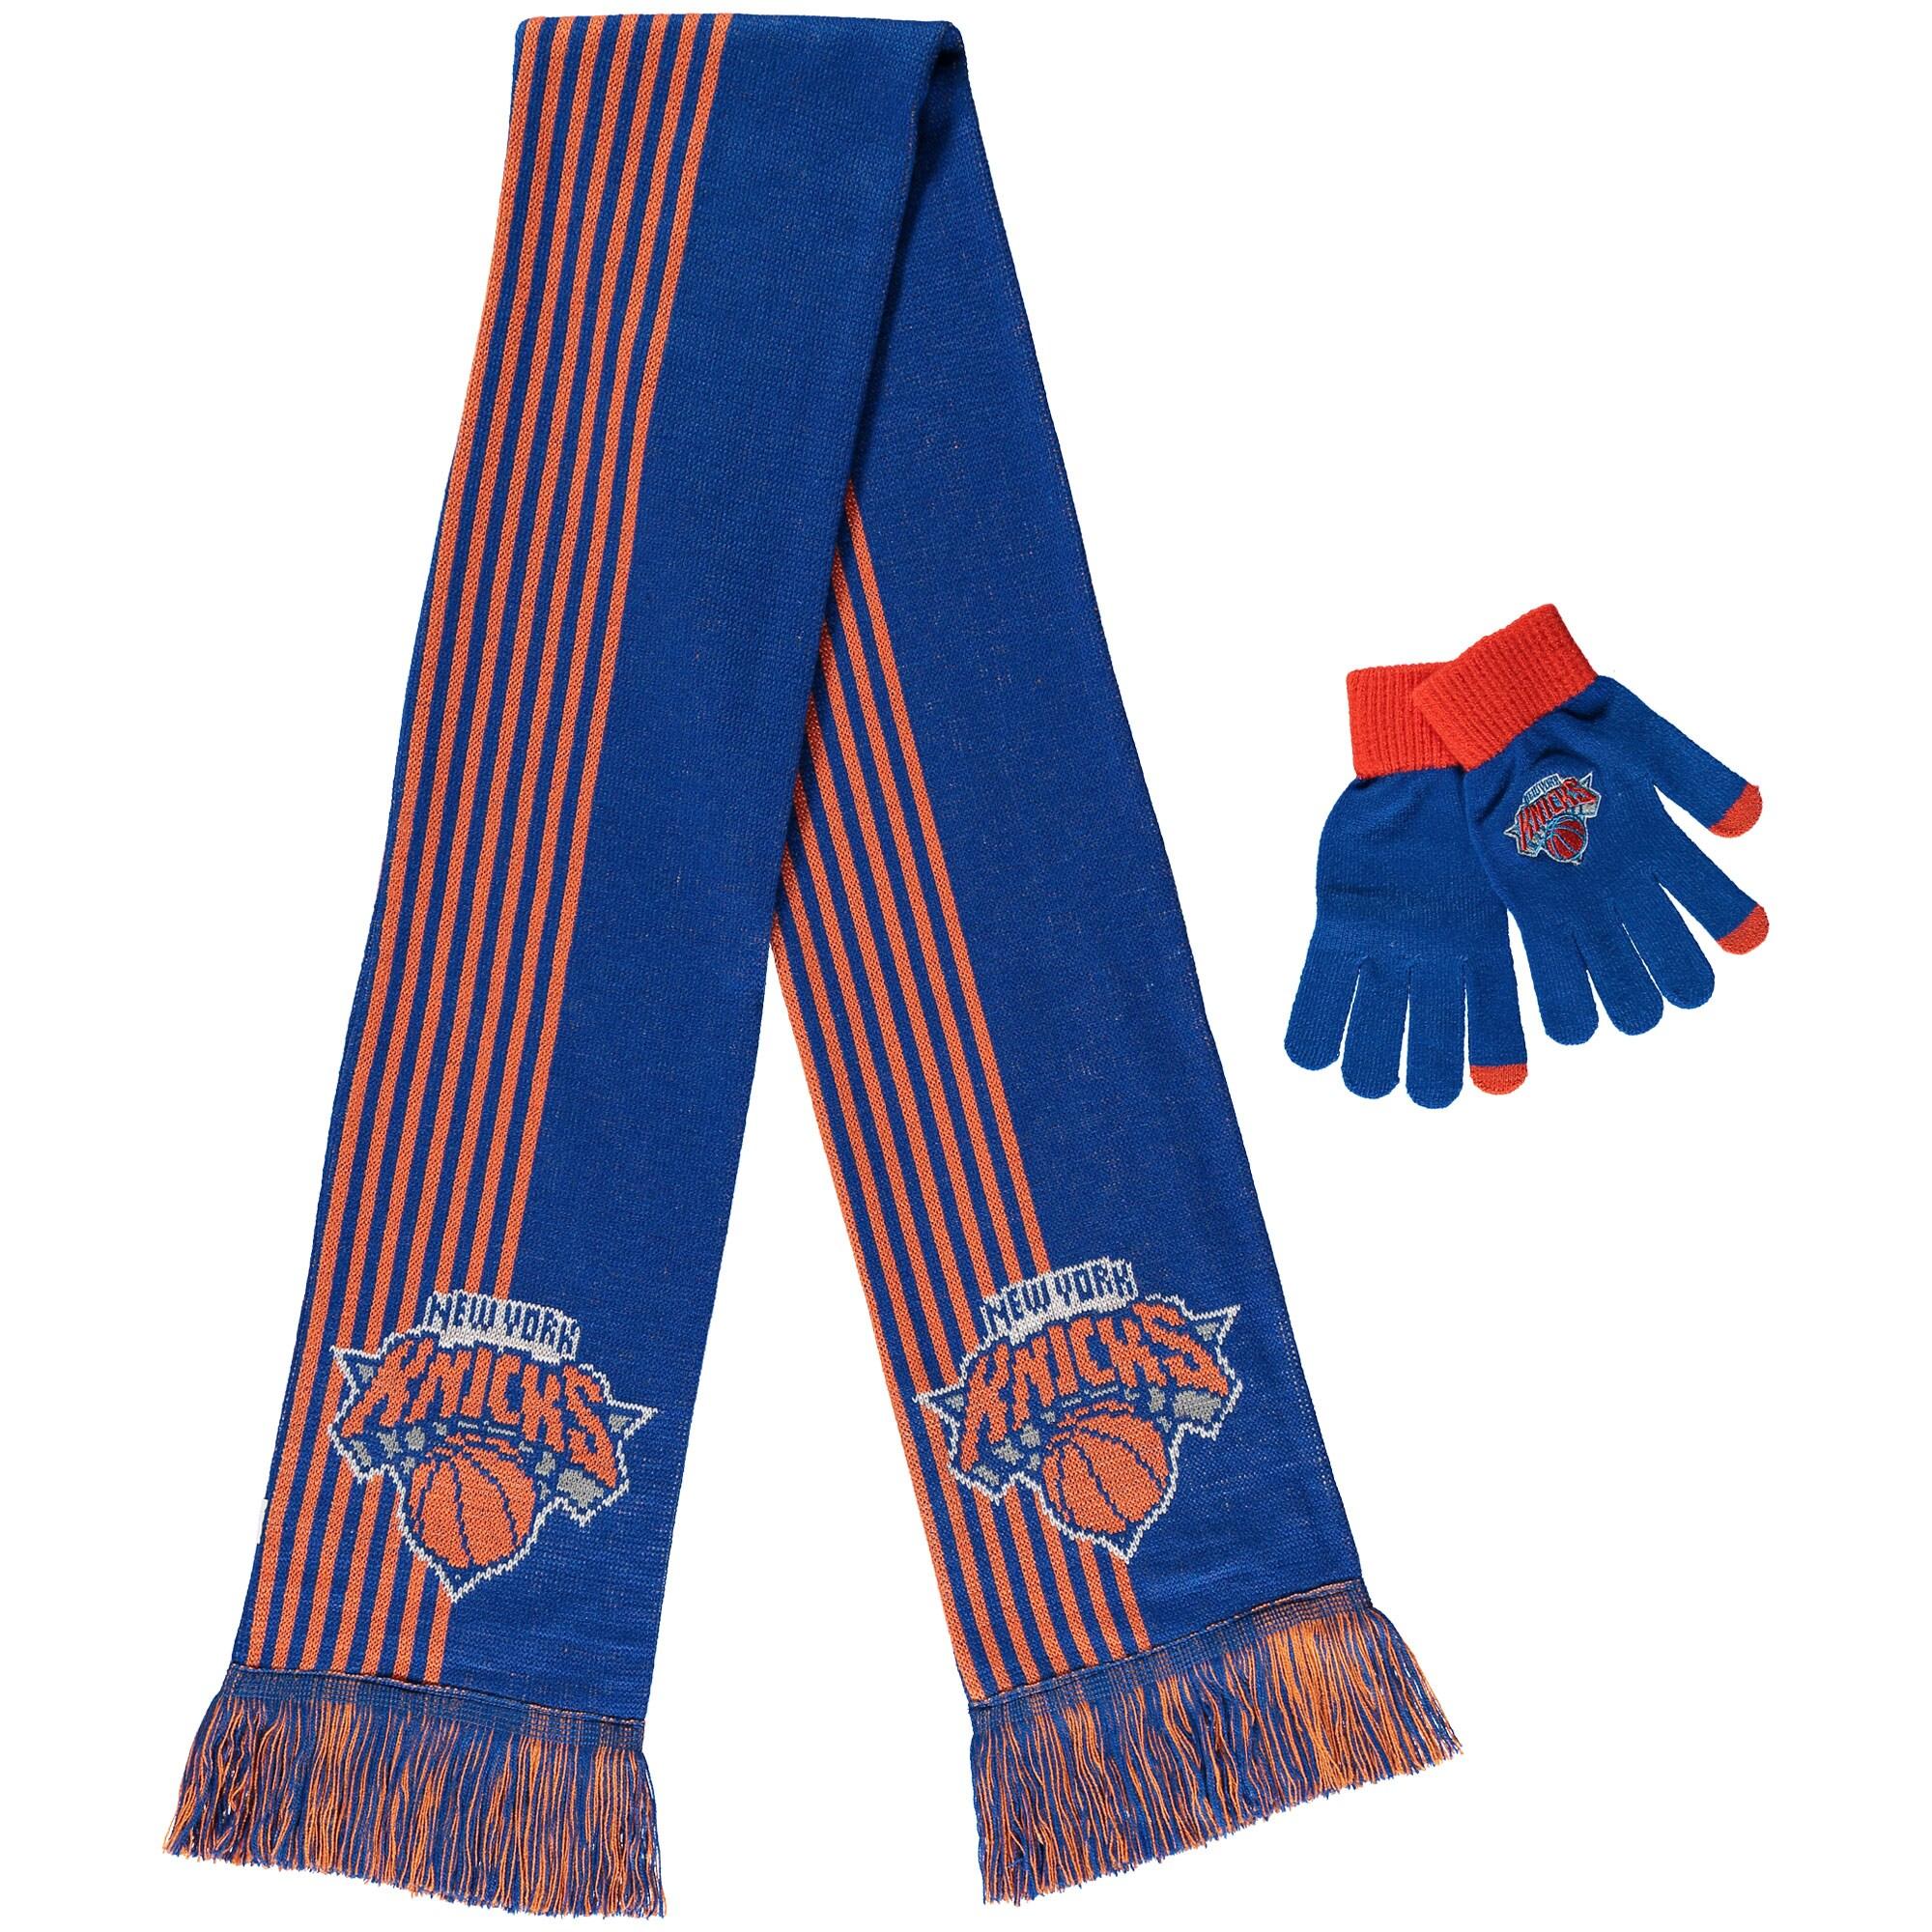 New York Knicks Women's Gloves & Scarf Set - Blue